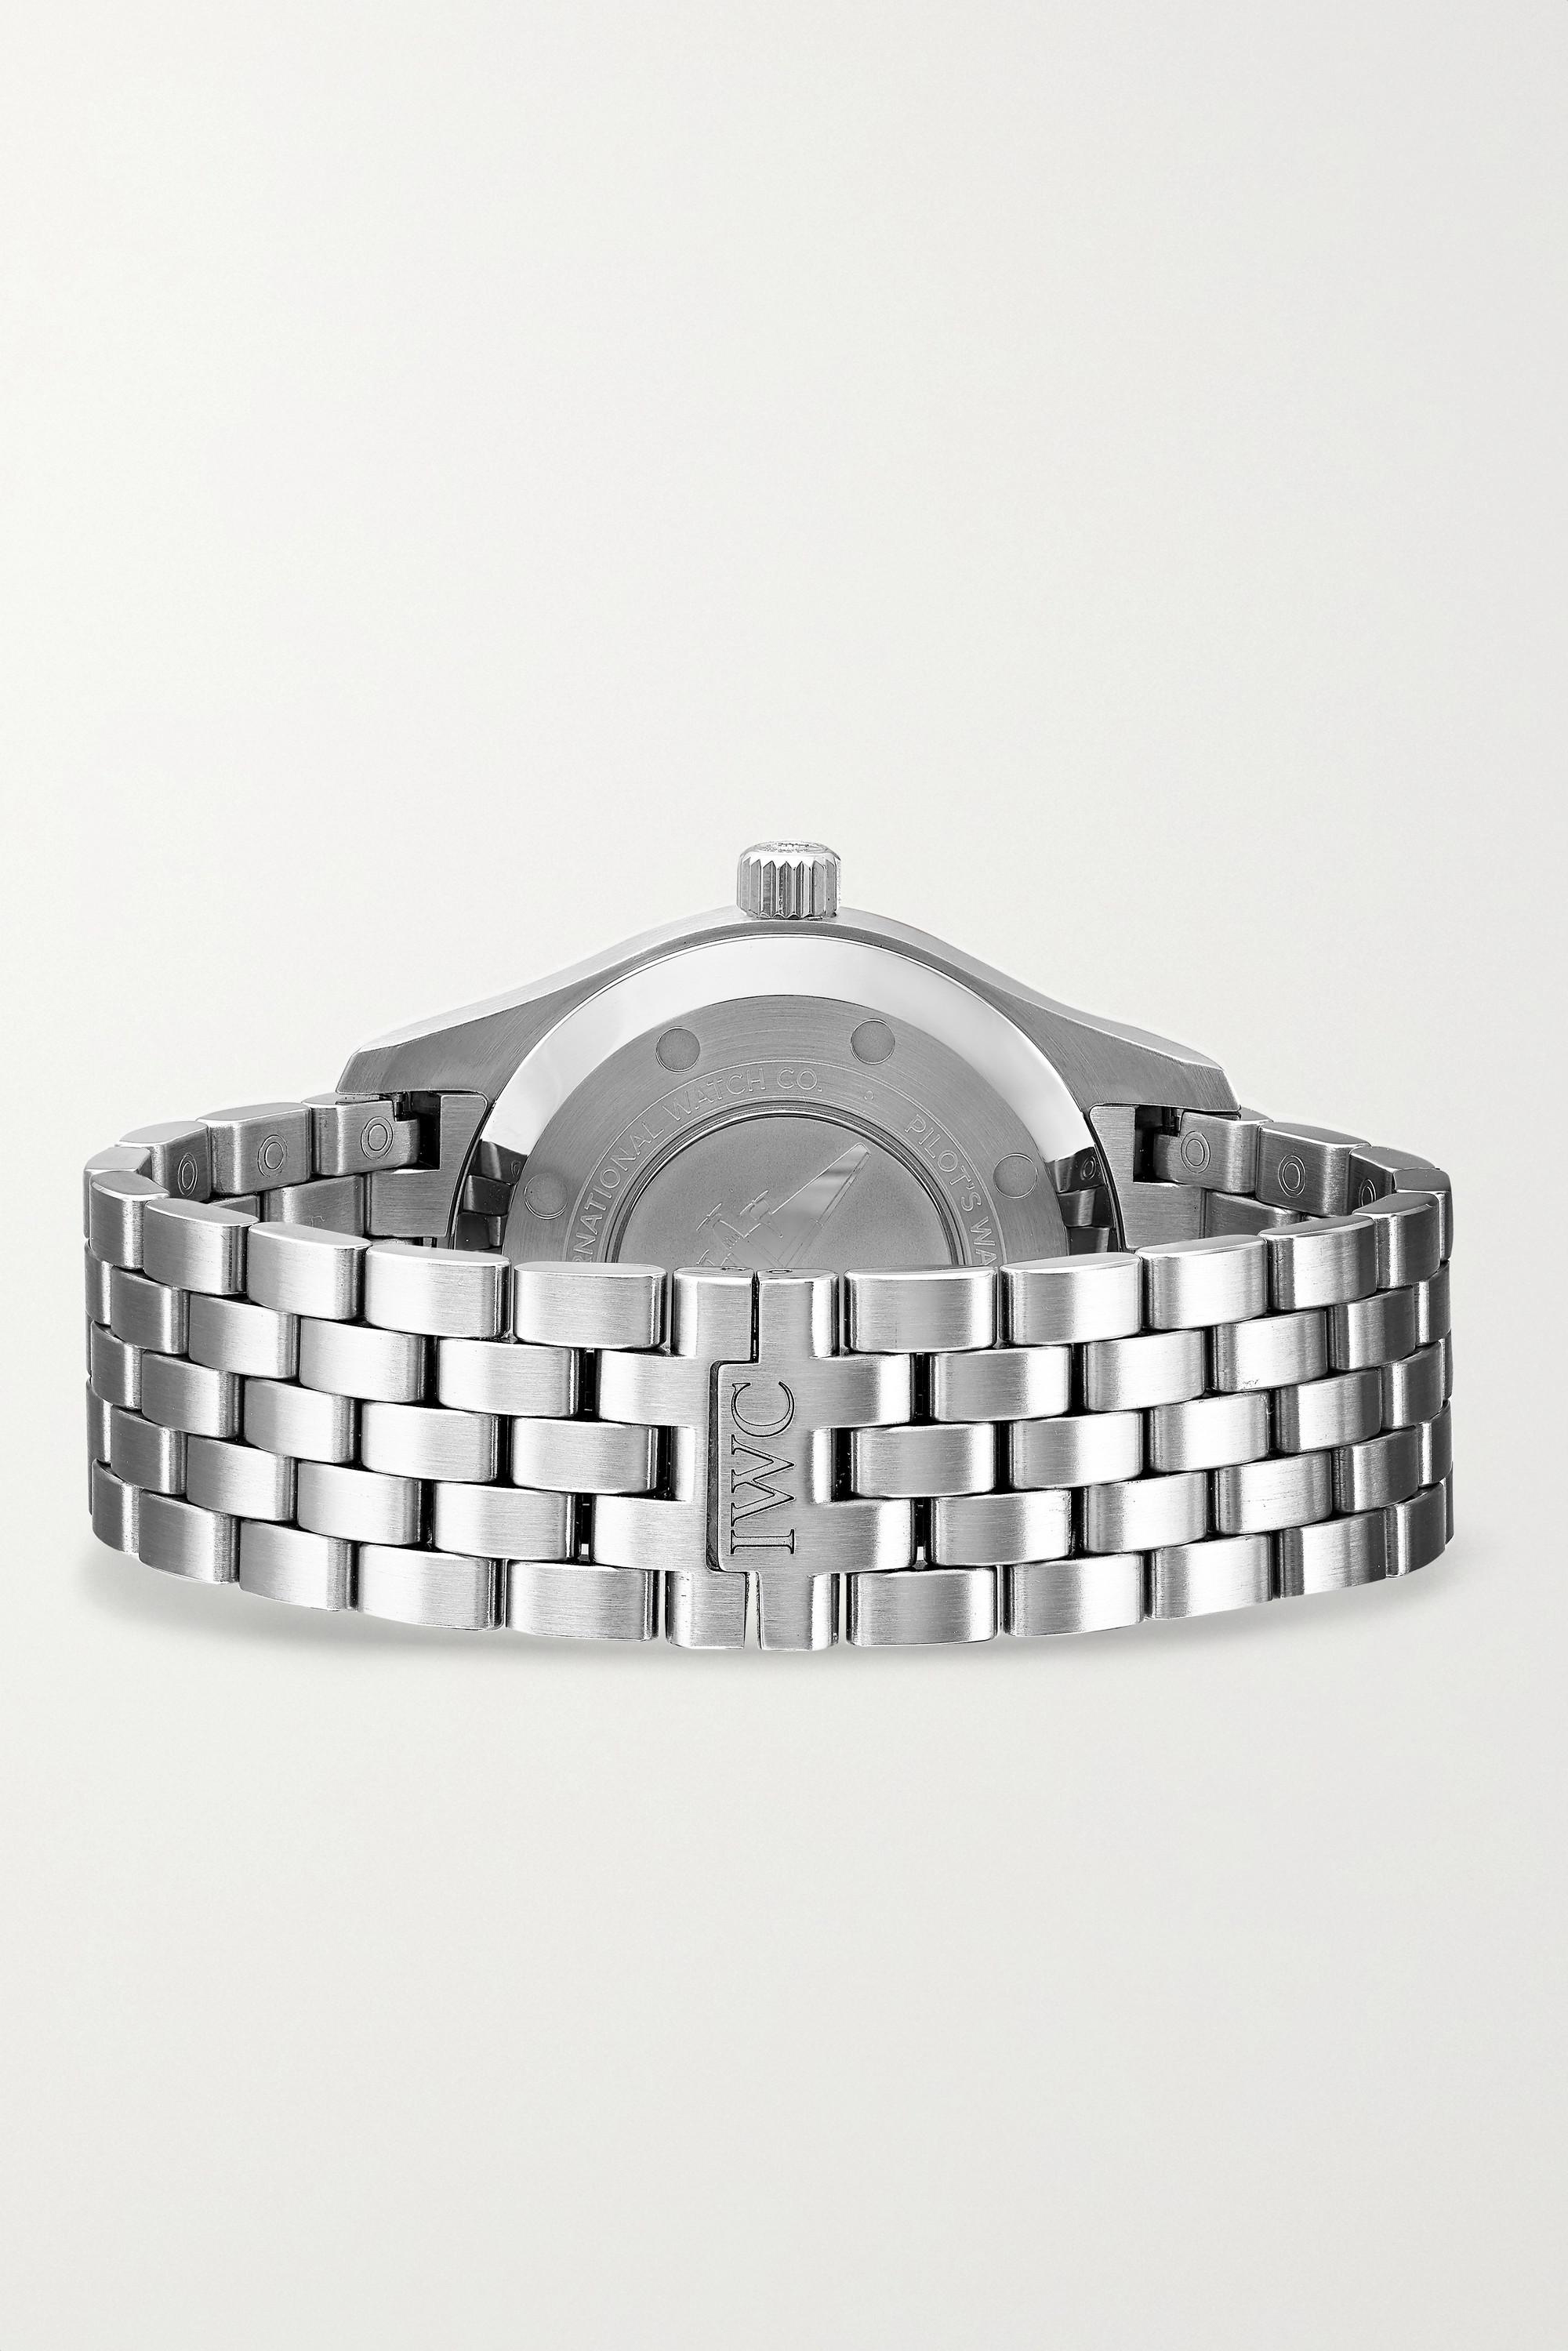 IWC SCHAFFHAUSEN Pilot's Automatic 36mm stainless steel watch